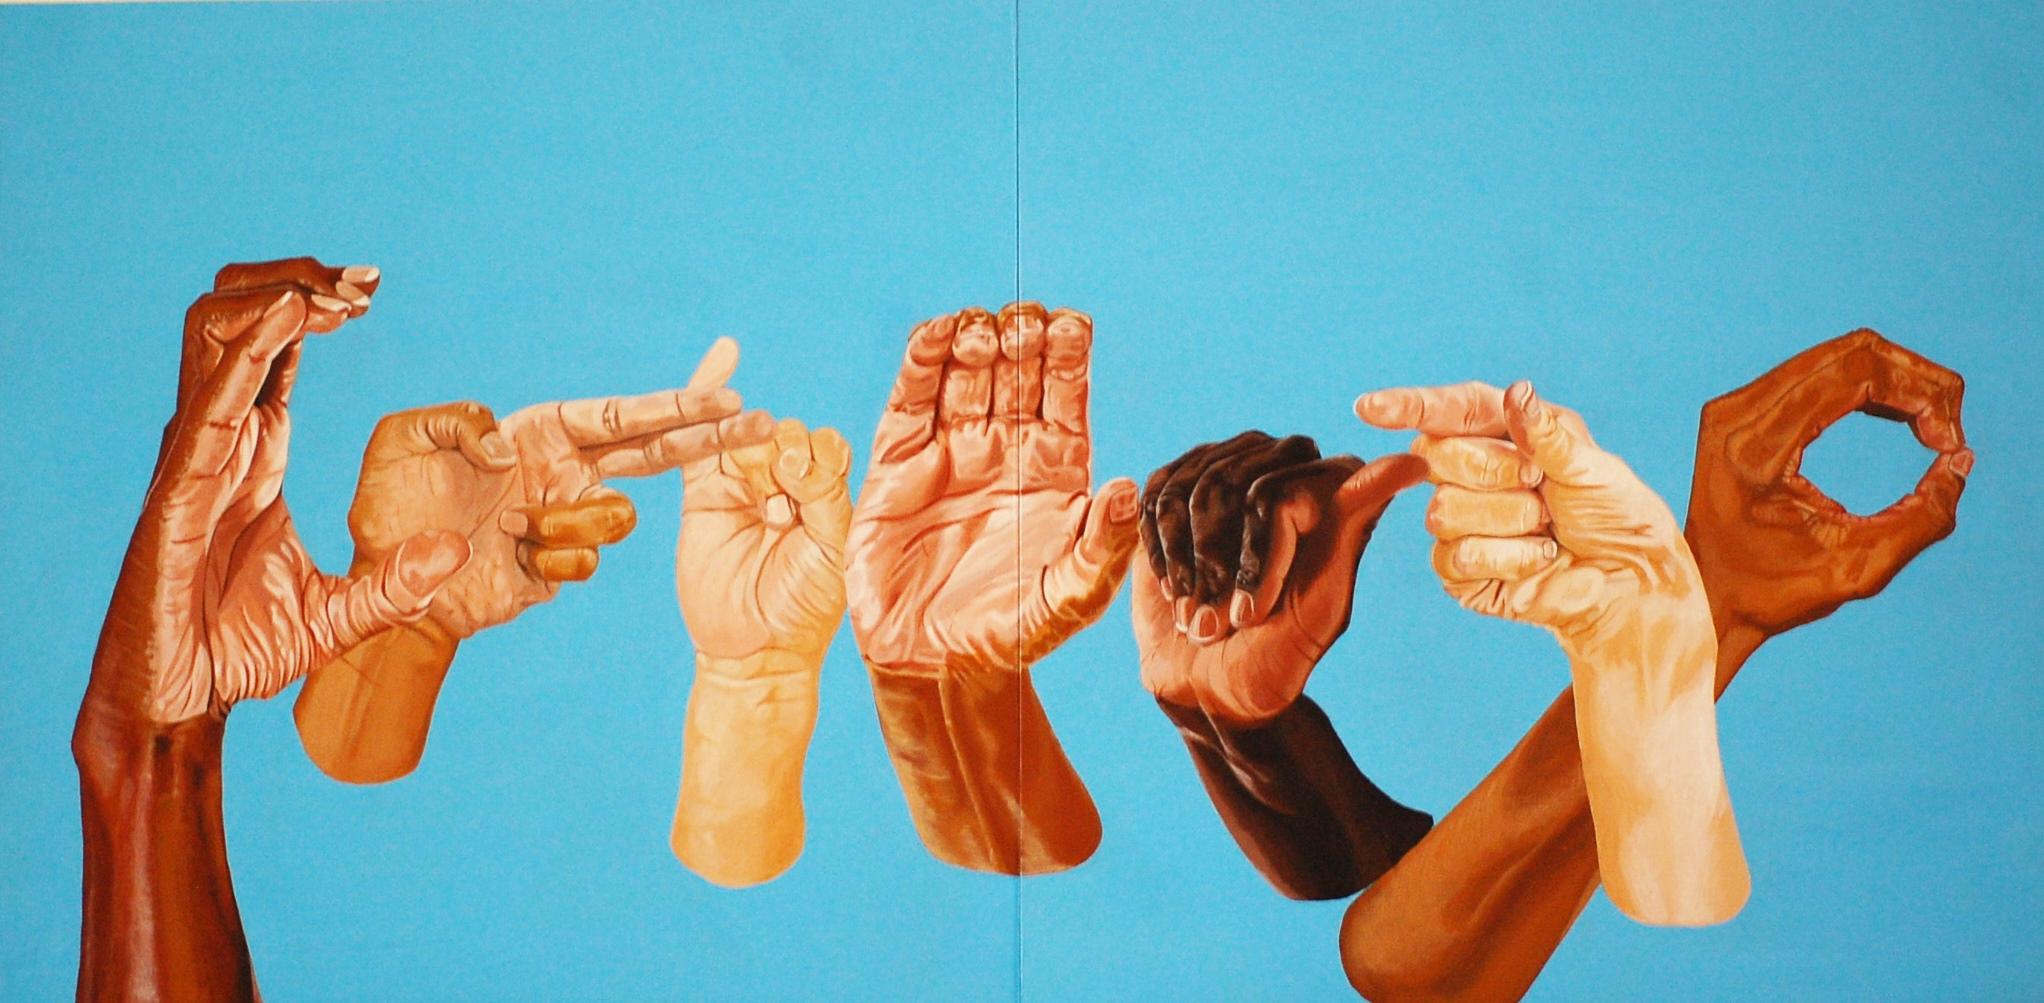 """C.H.I.C.A.G.O. Sign Language"" 2014"